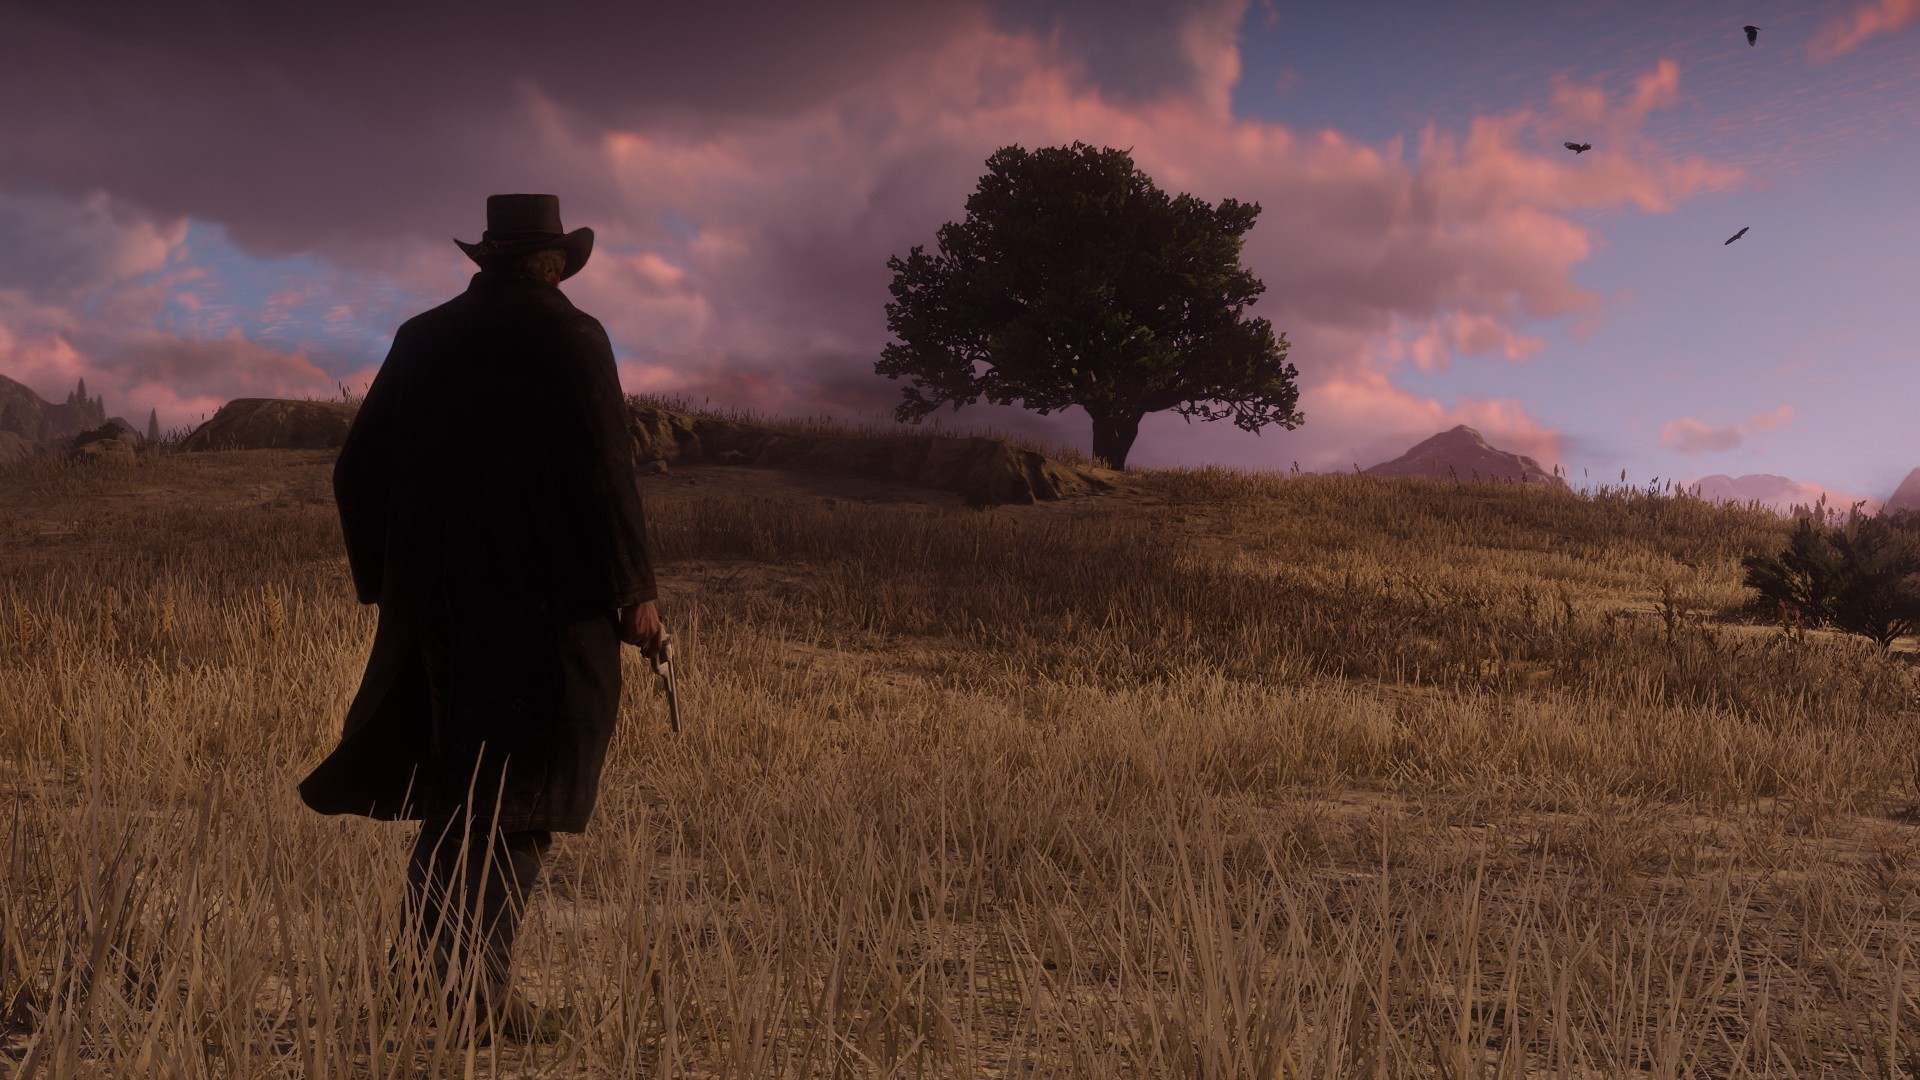 Red Dead Redemption 2 İncelemesi | Red Dead Redemption 2 Silah